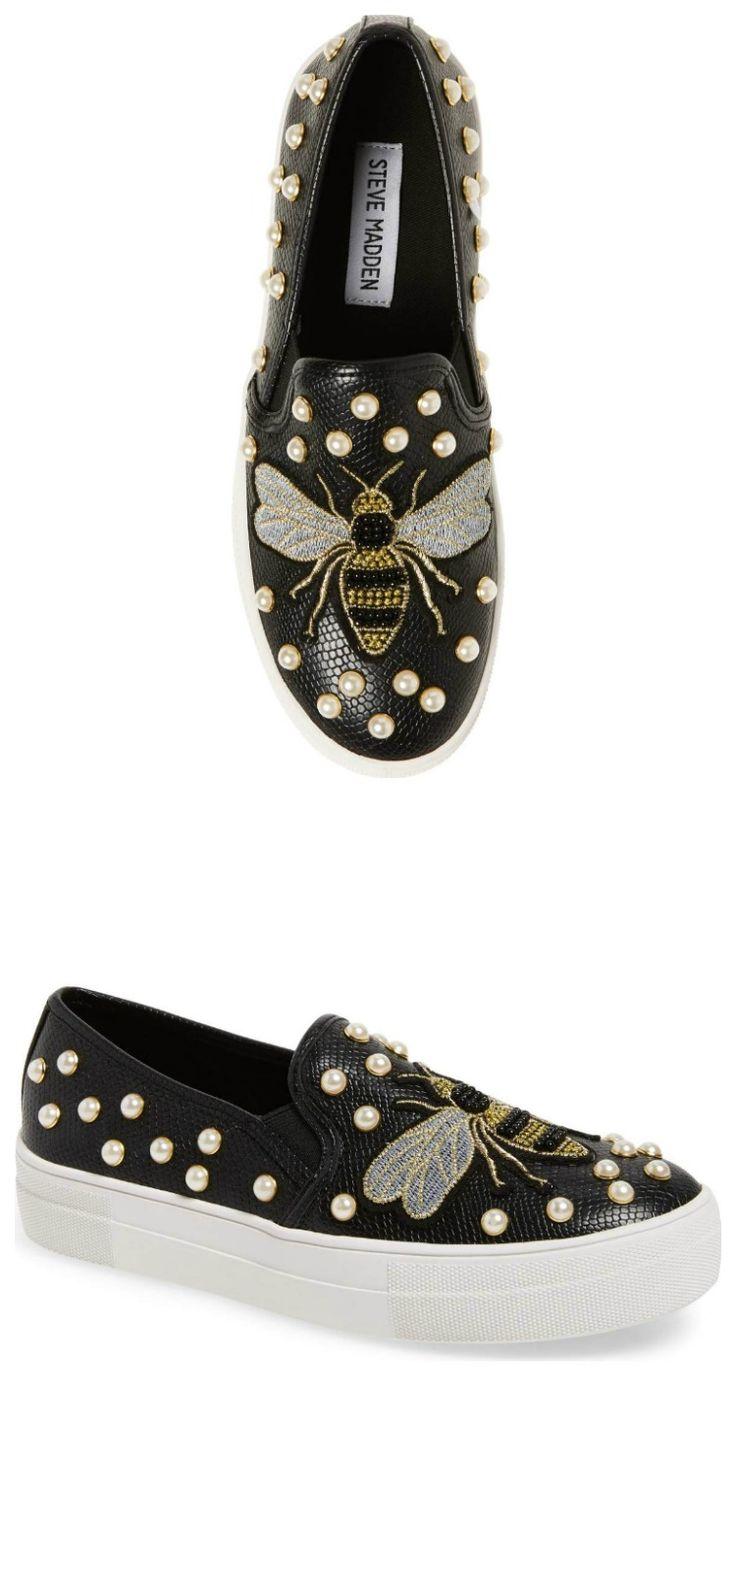 Women's Steve Madden Polly Bee Embellished Slip-On Platform Sneaker #ad #bees